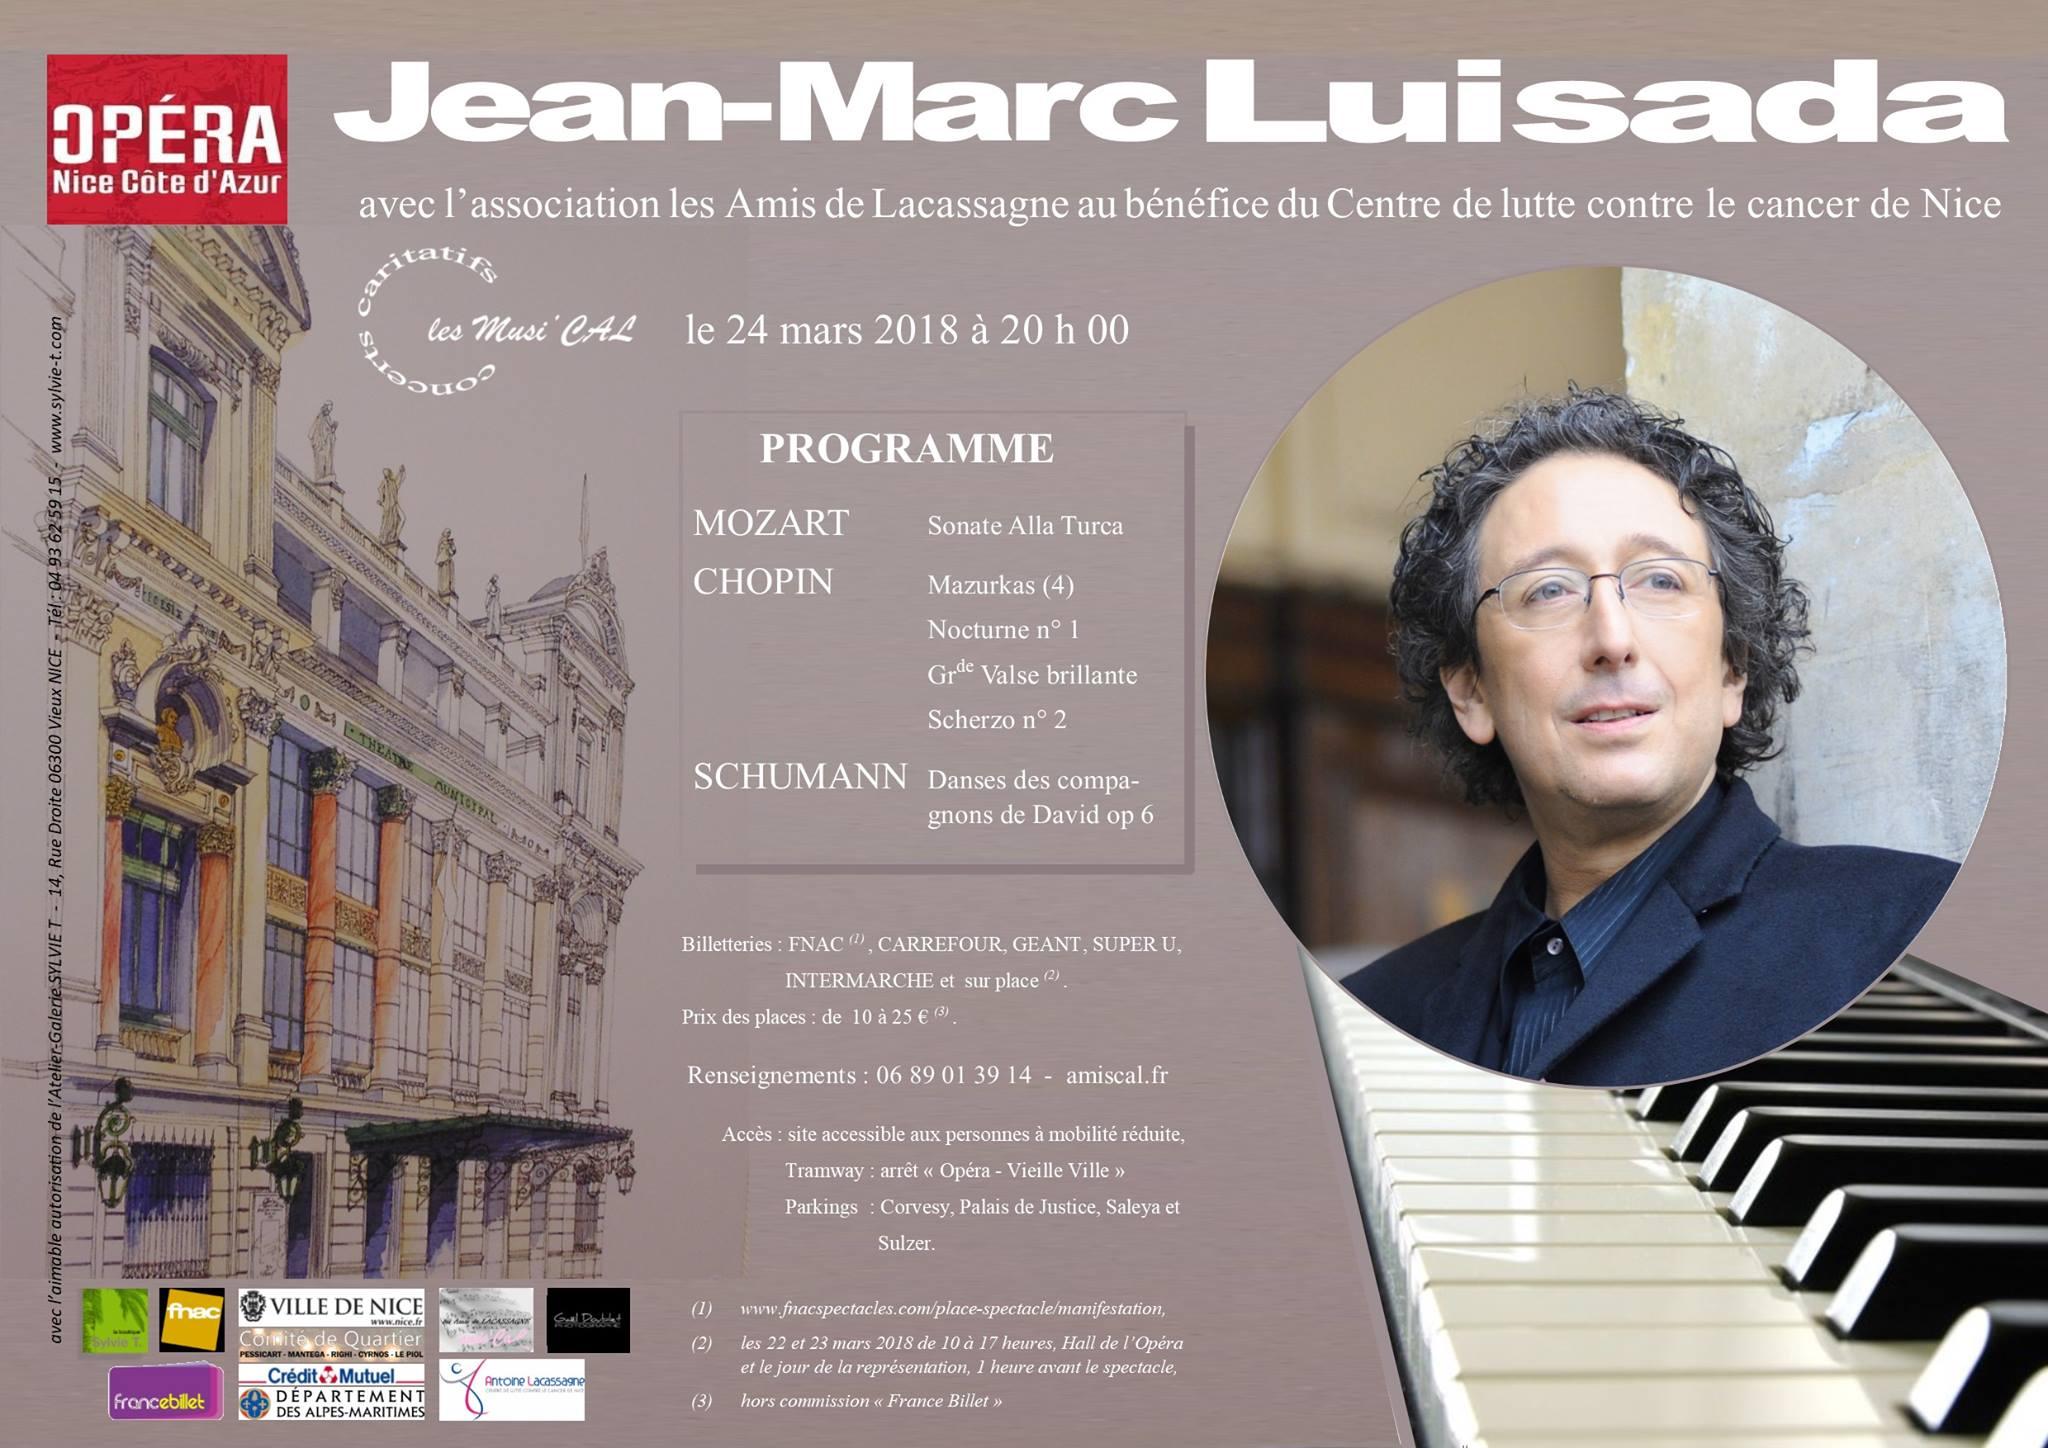 Concert Luisada 24 mars